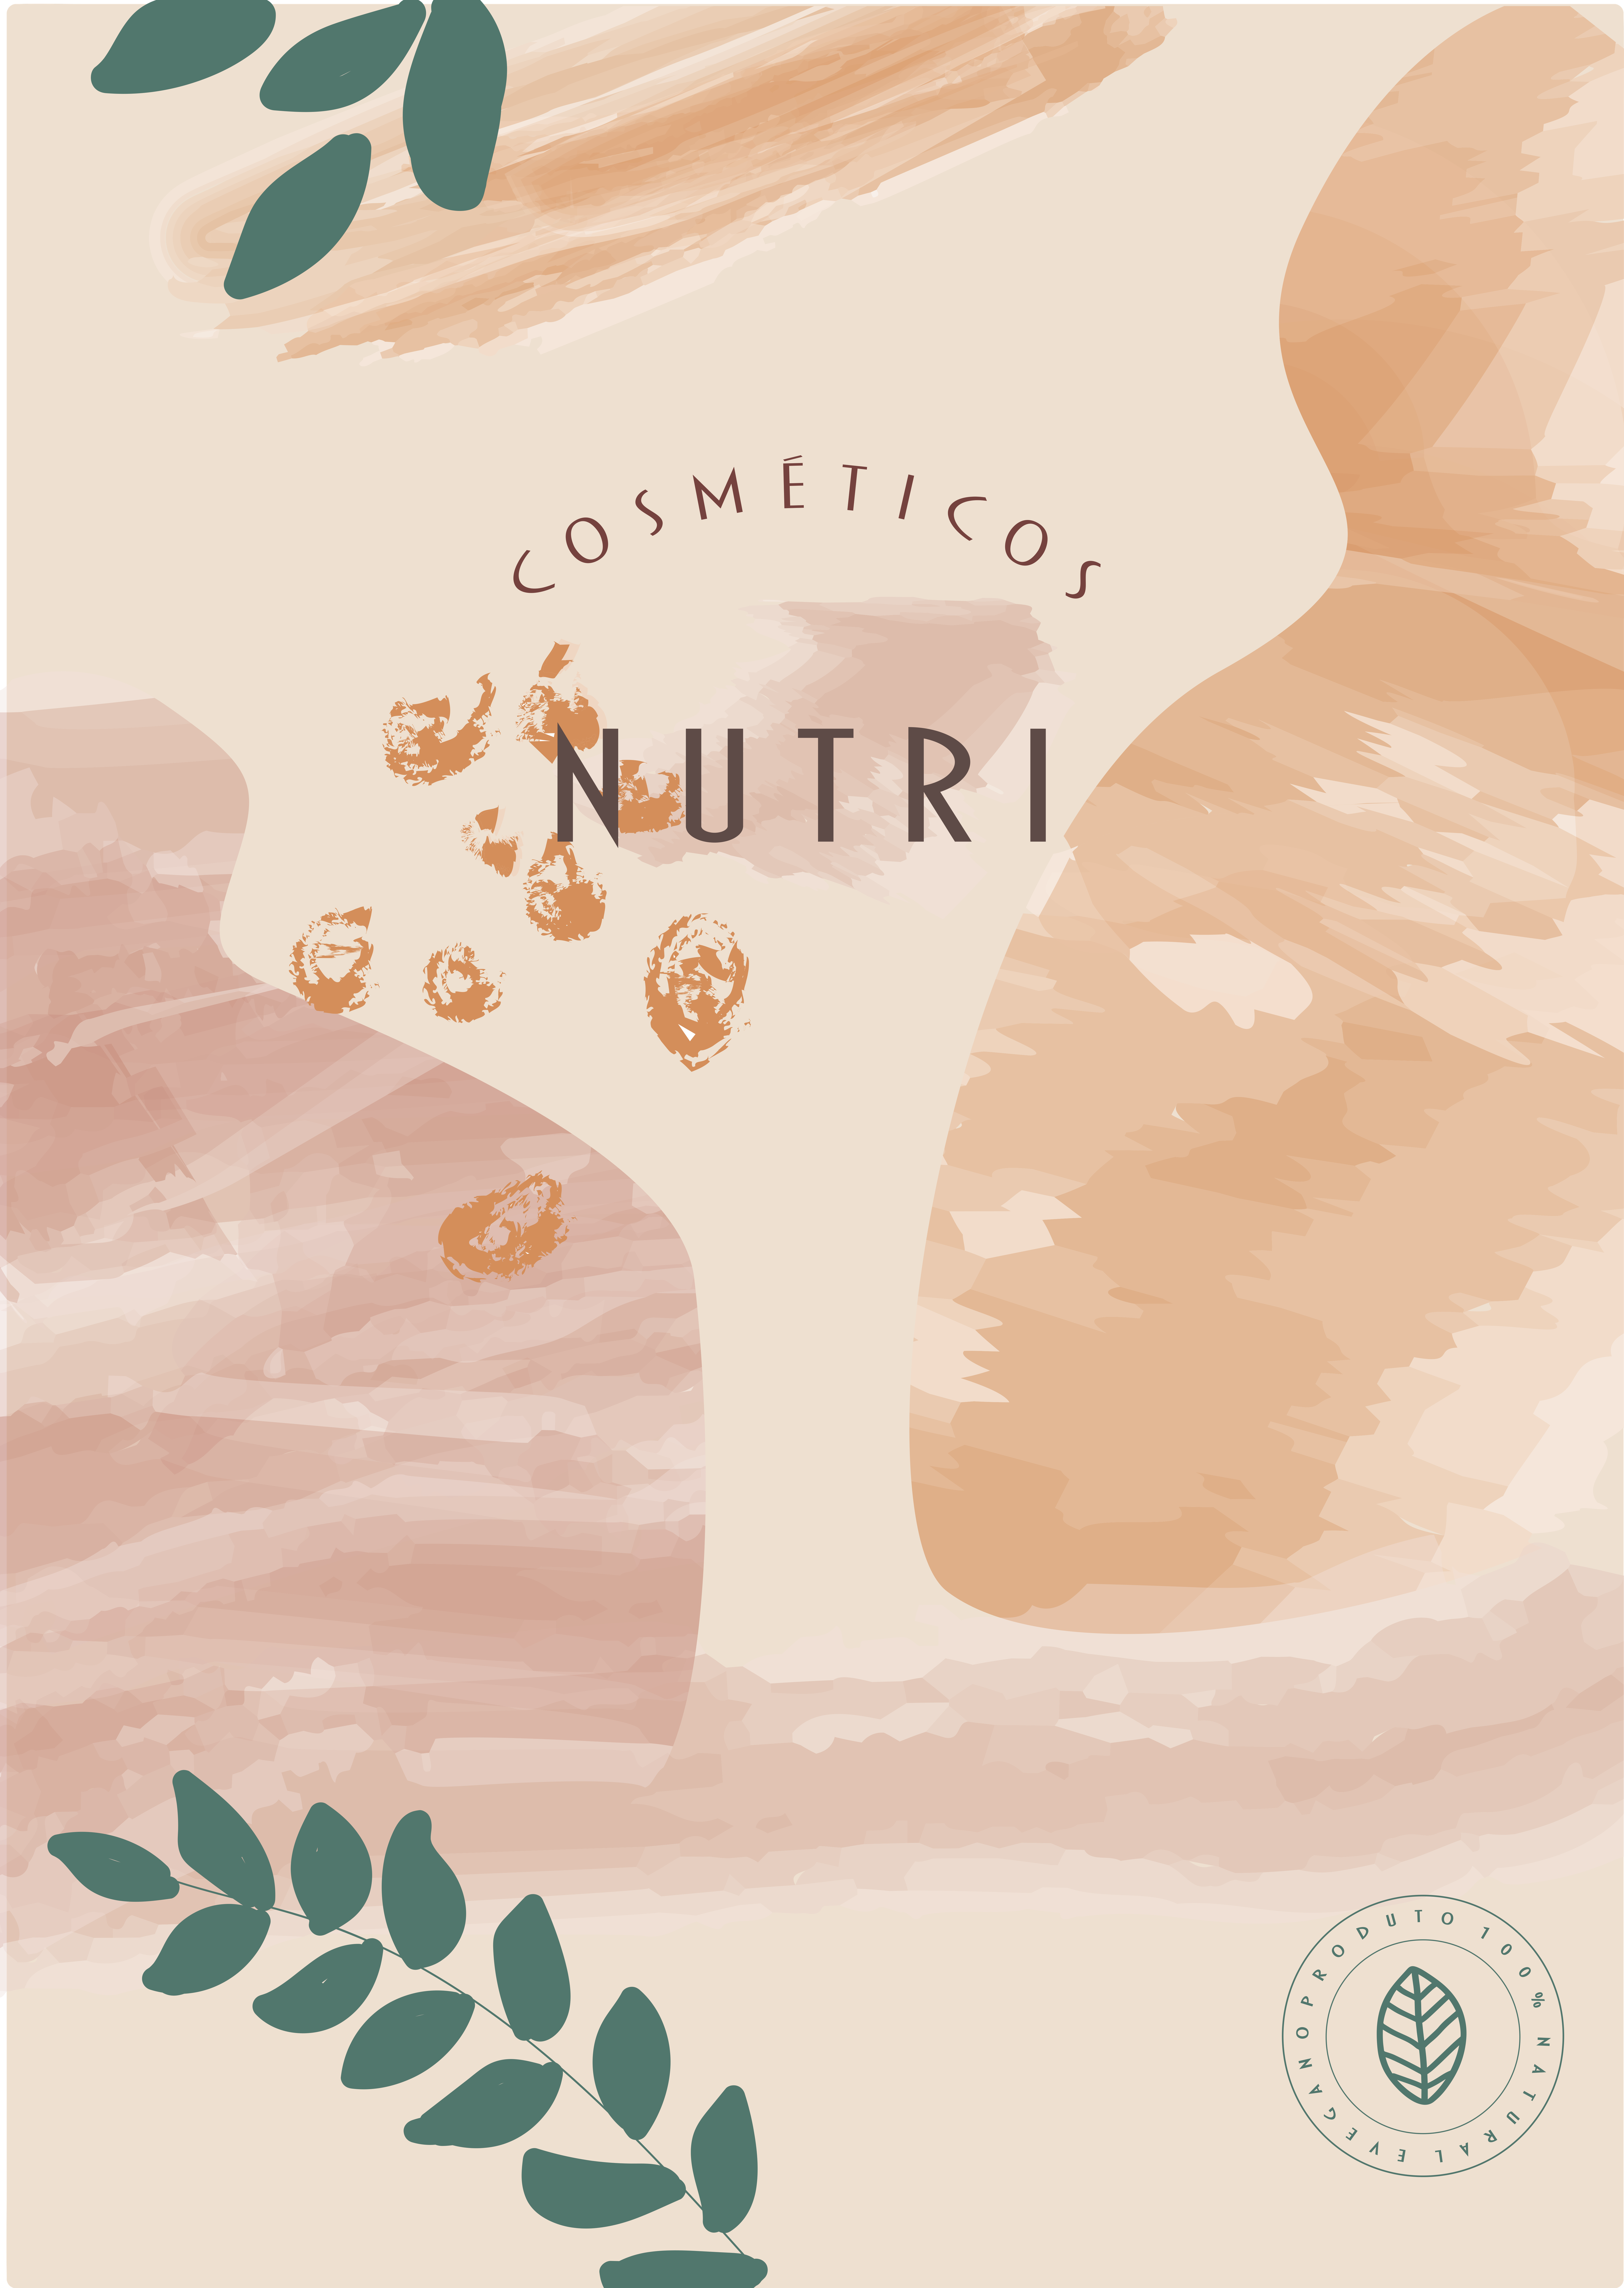 Nutri Cosméticos-1